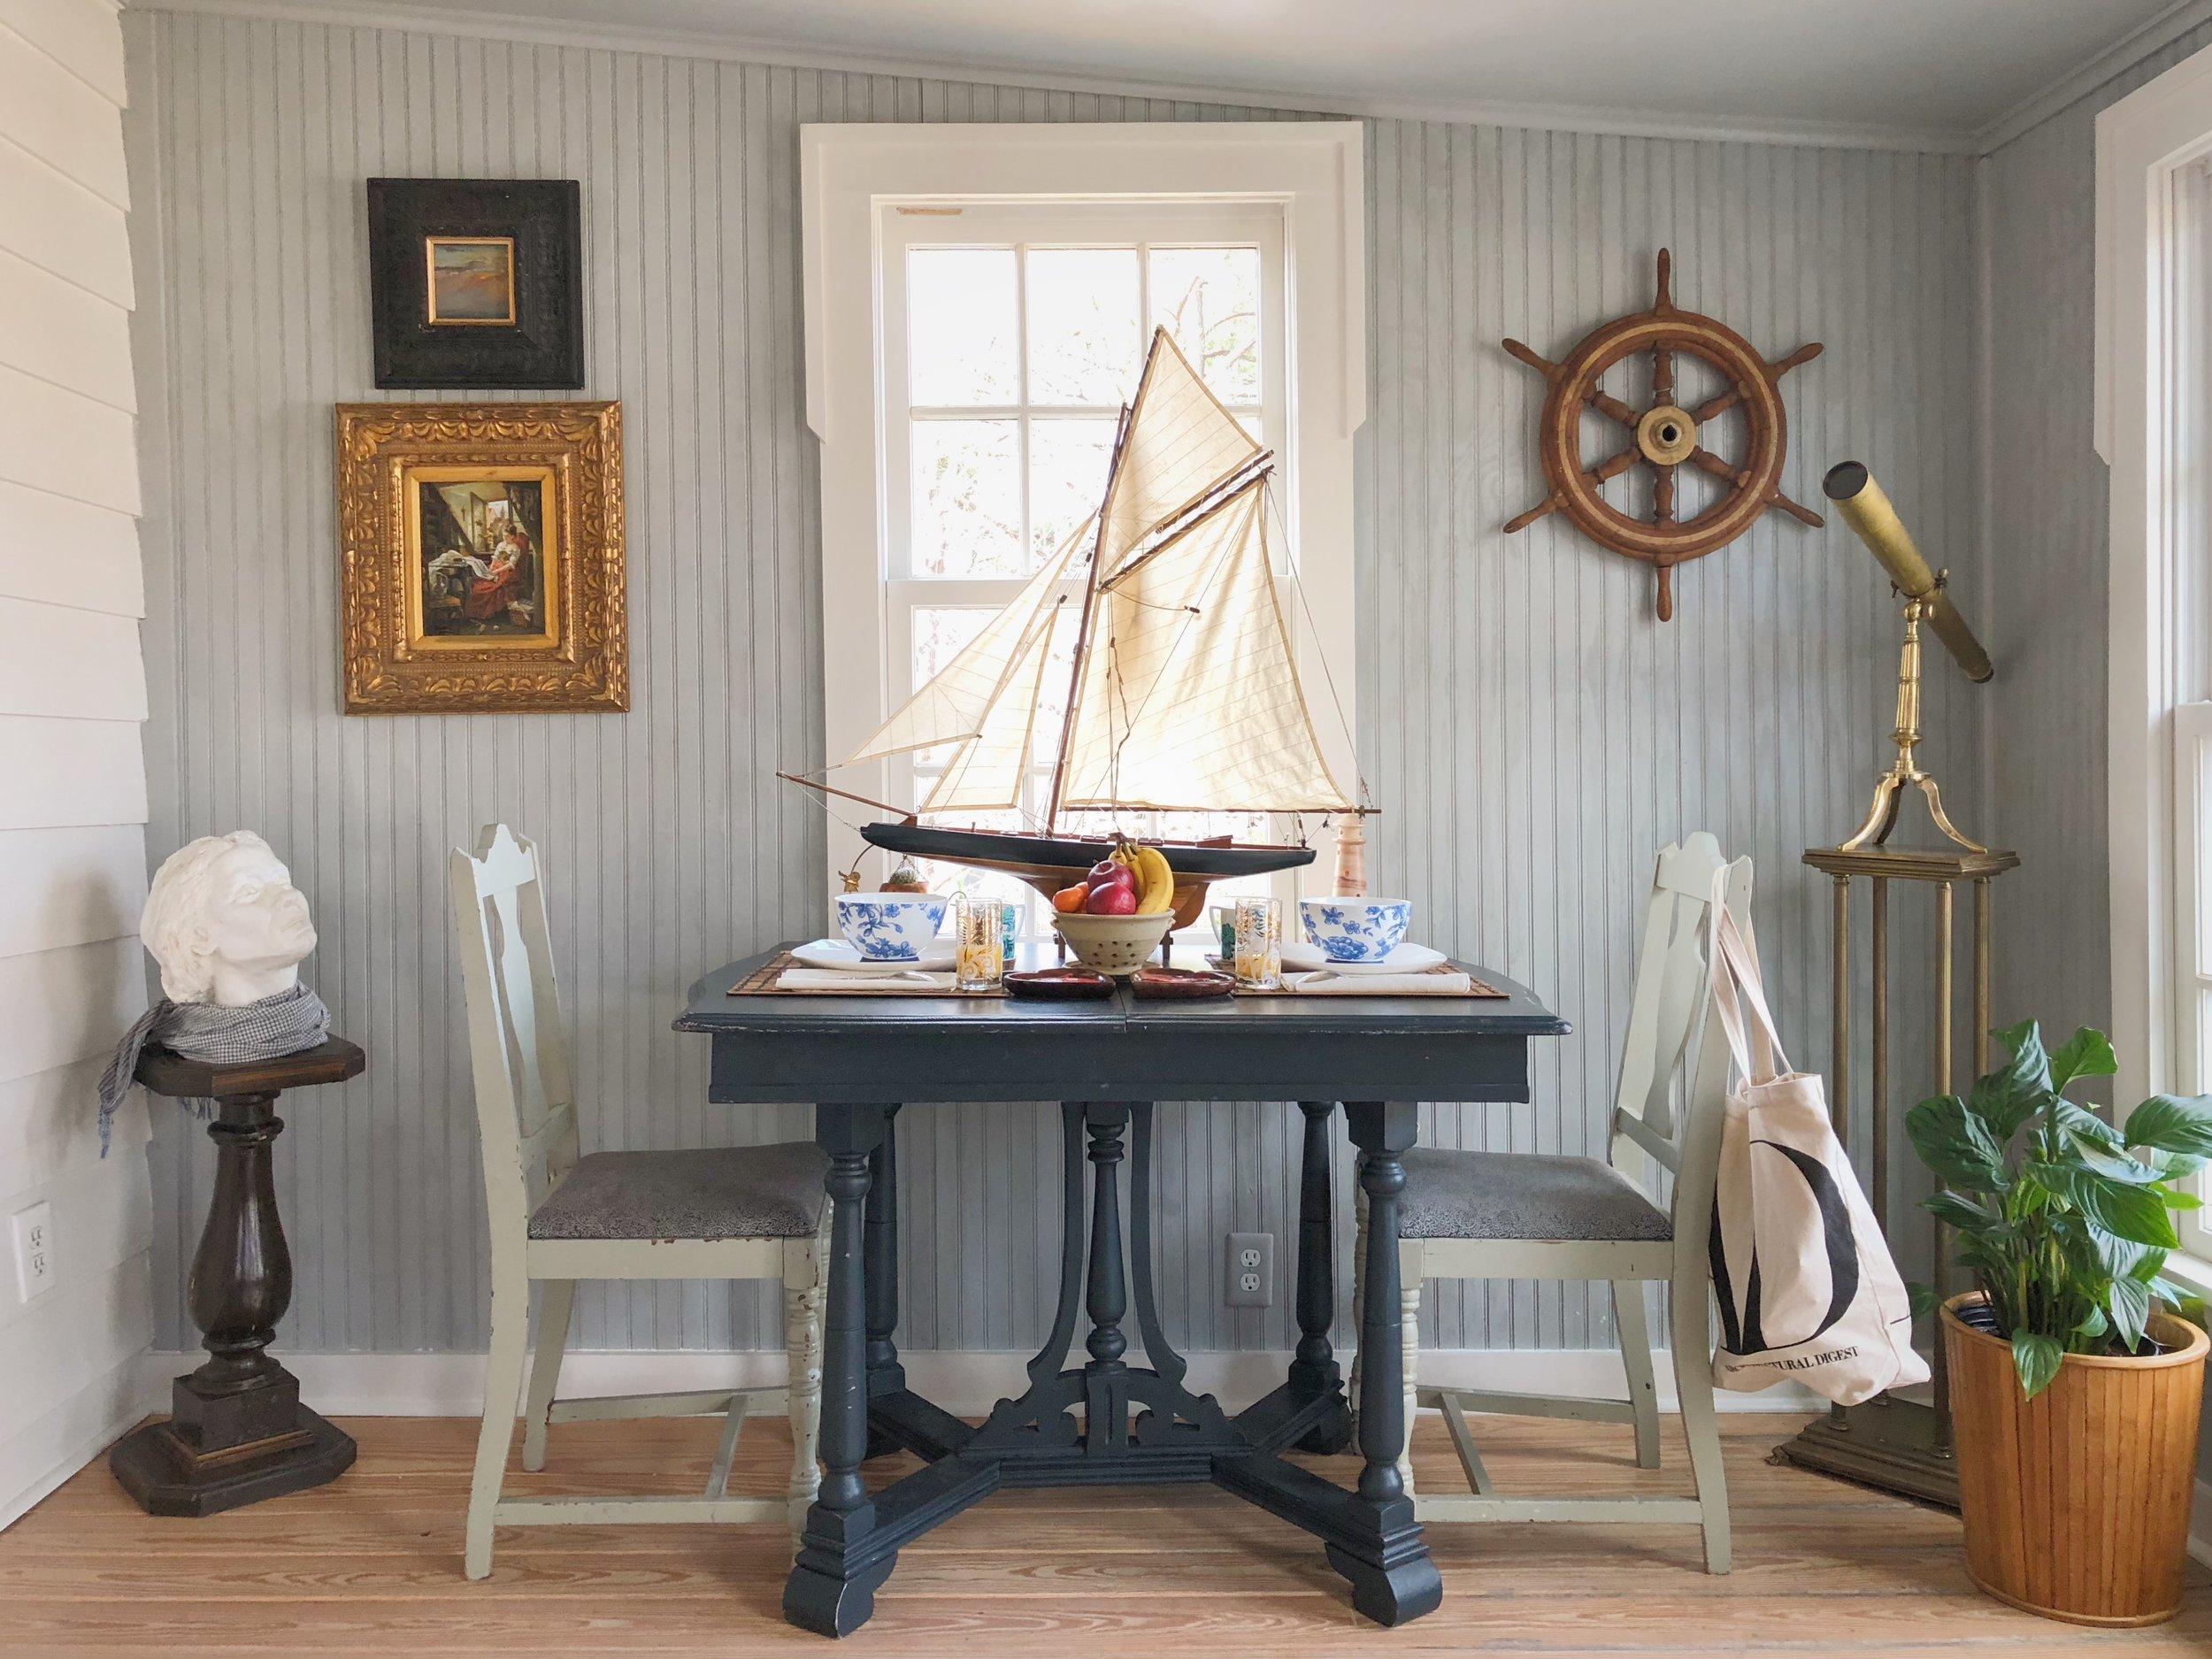 breakfast-bedroom-nautical.JPG